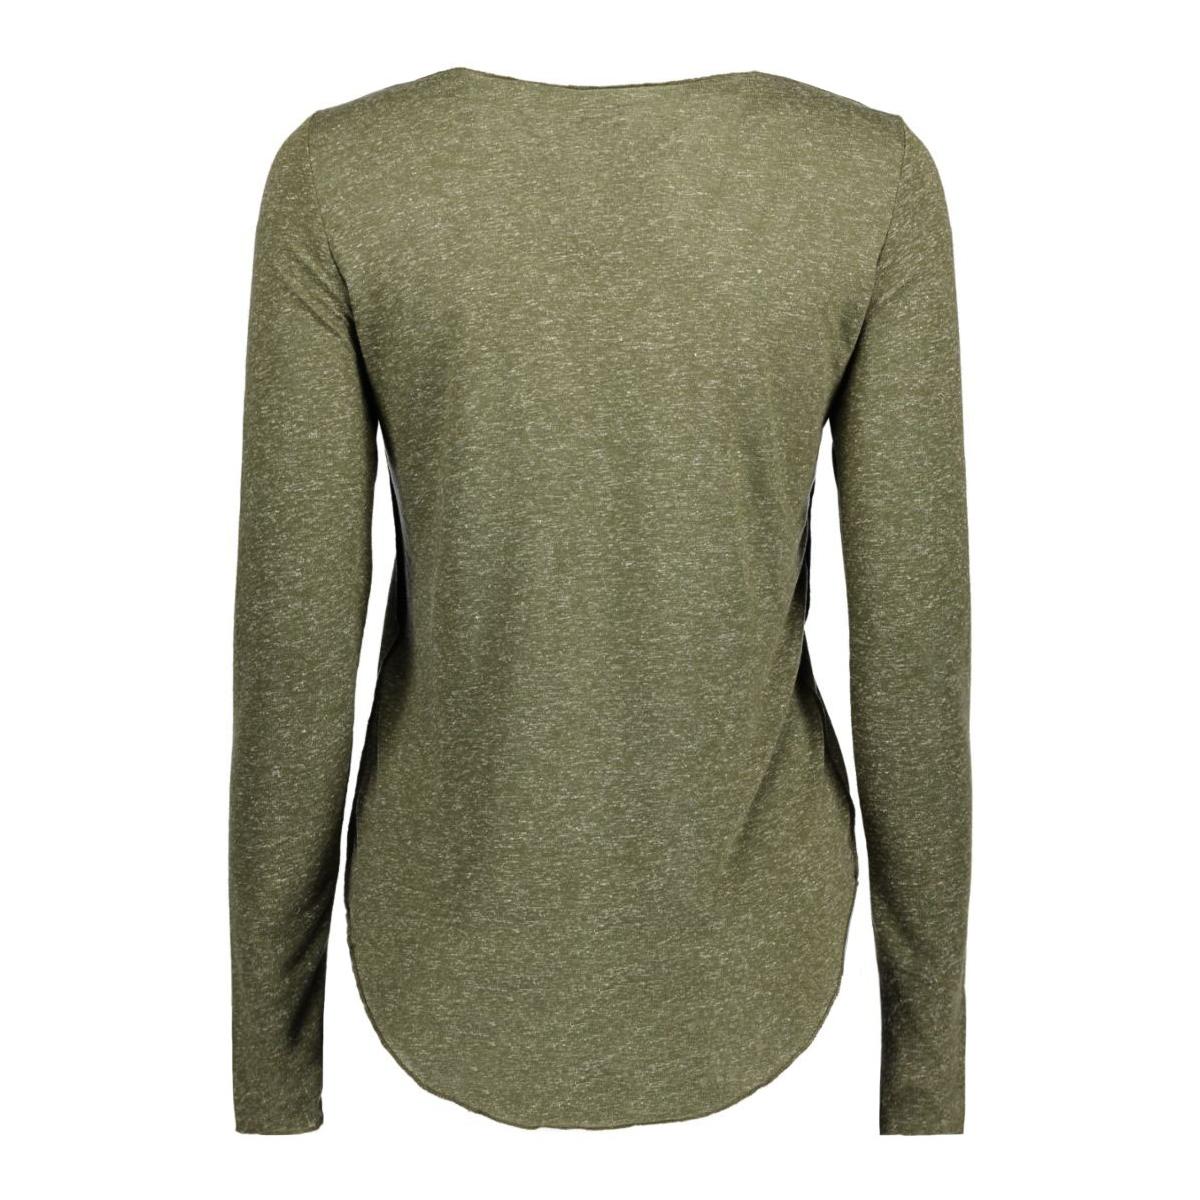 vmlua ls top noos 10158658 vero moda t-shirt ivy green